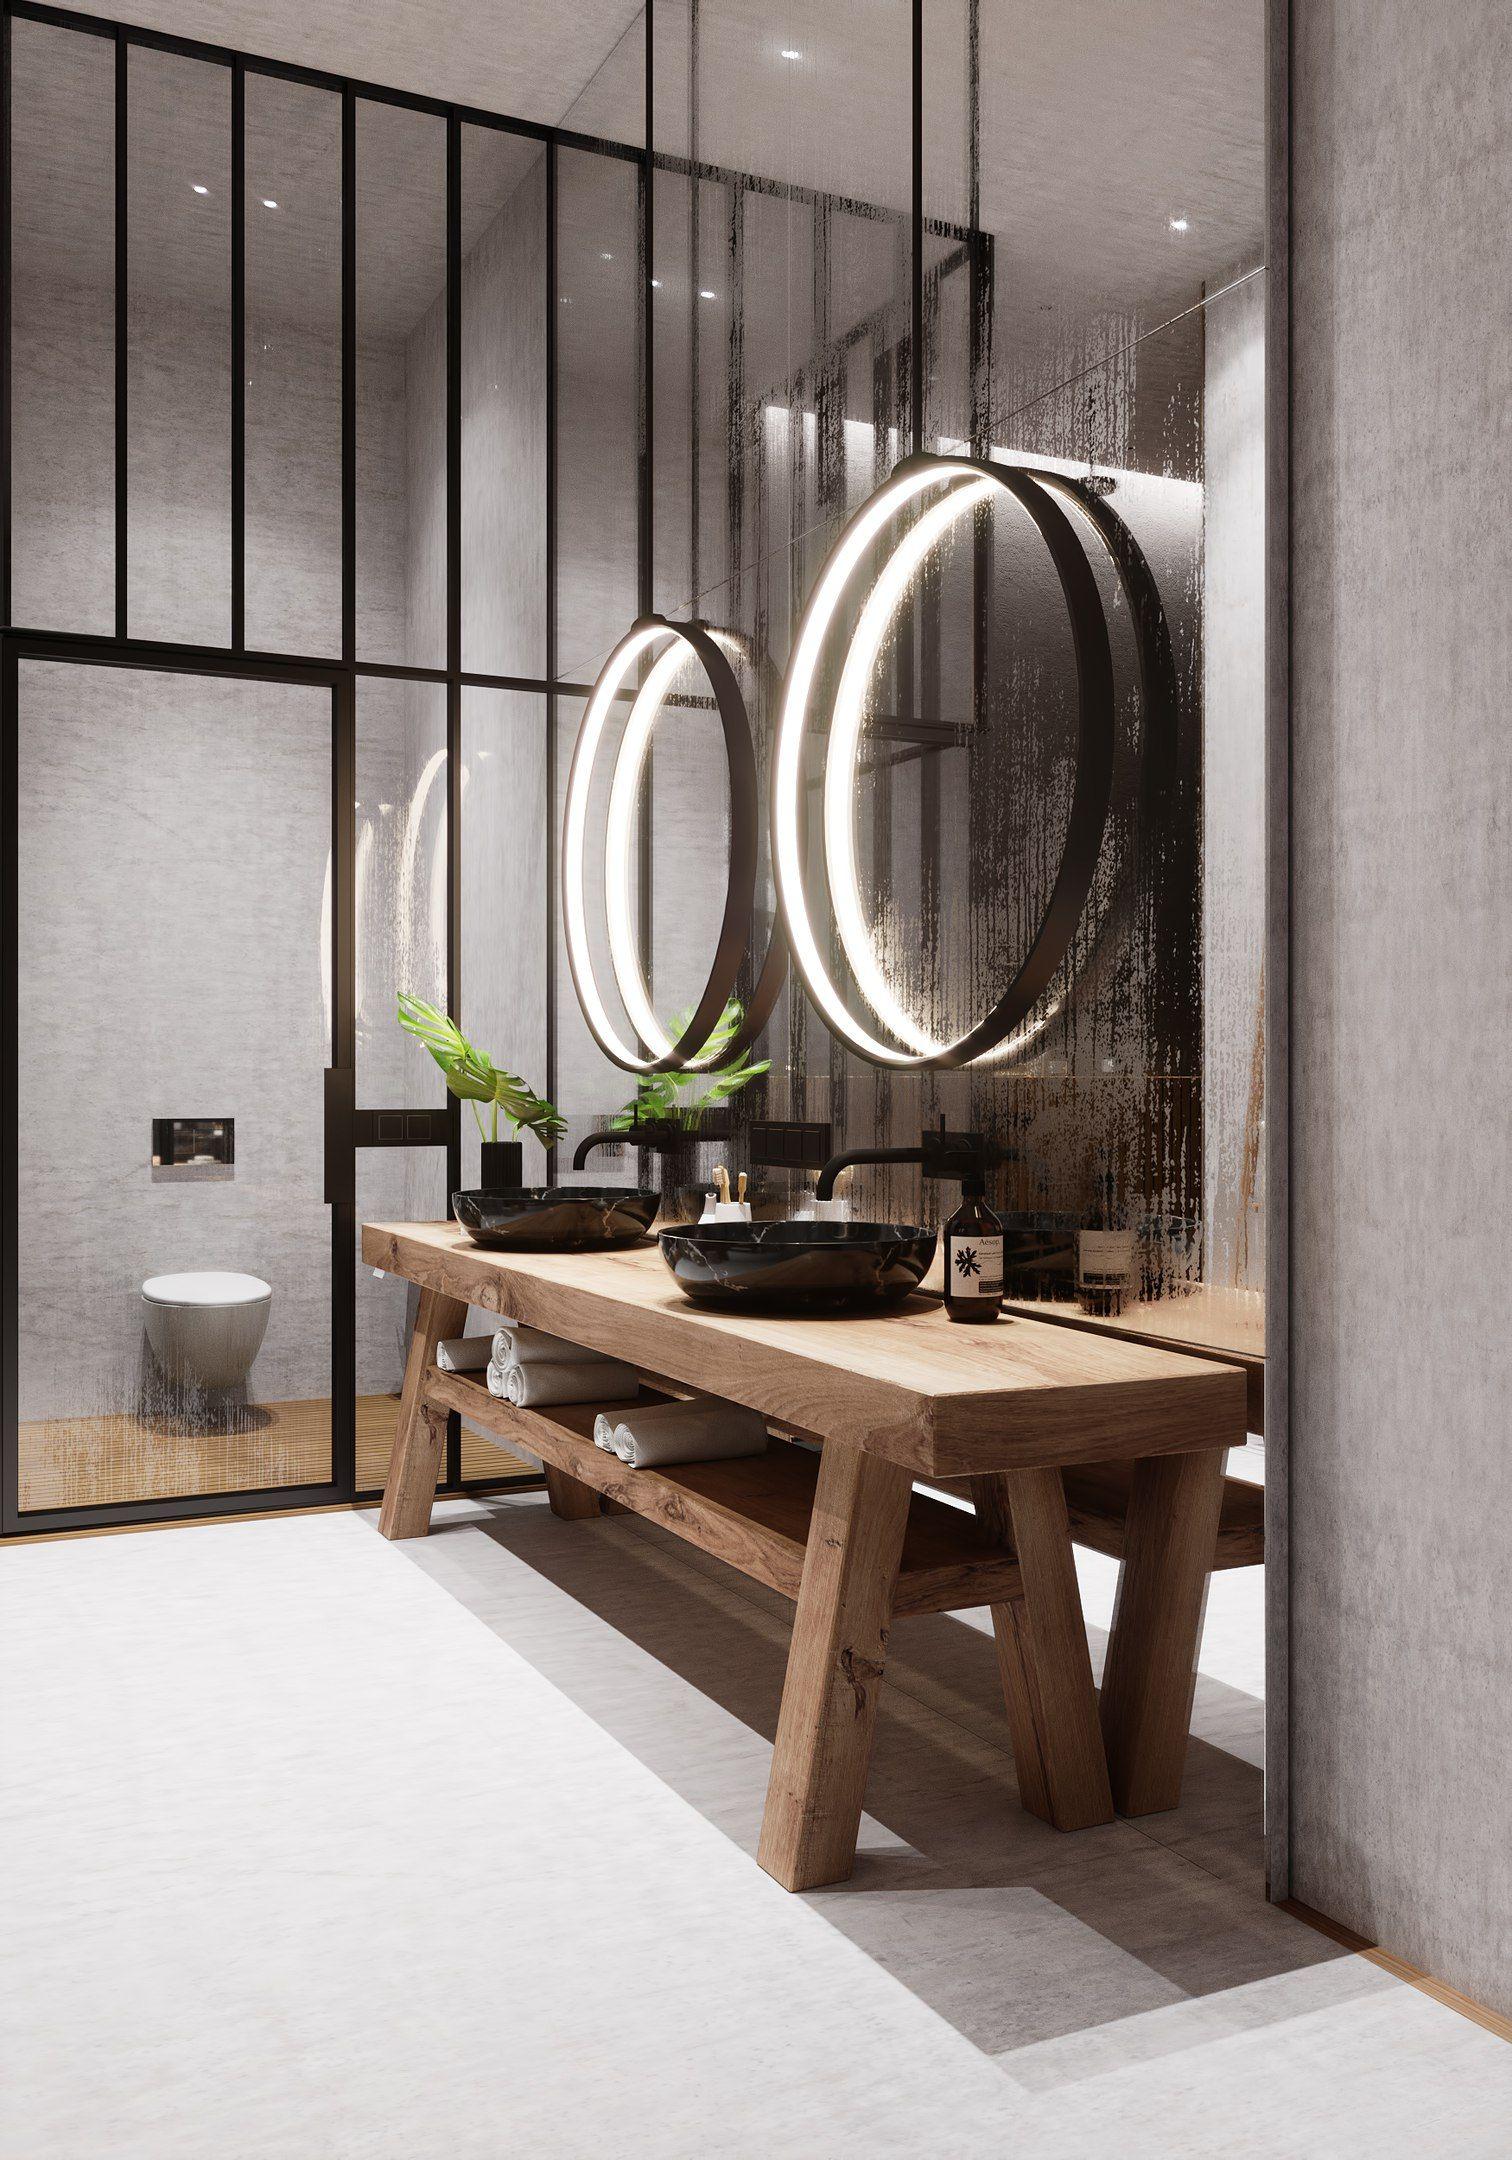 Salon De Bain Moderne salle de bain moderne, industrielle | julie | pinterest